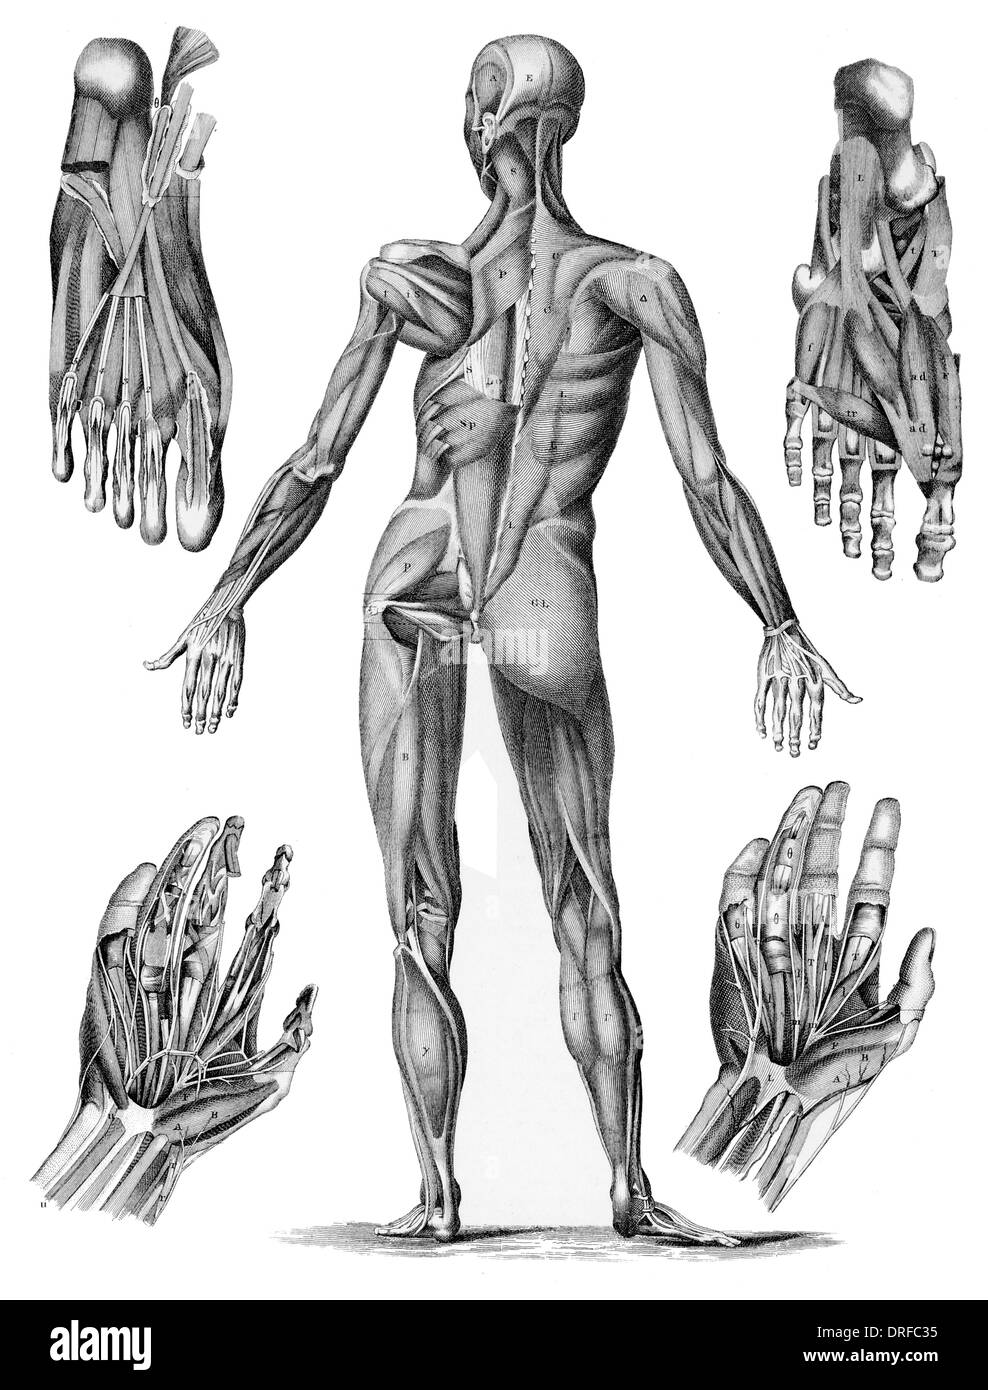 Anatomia da musculatura humana - os músculos do sexo masculino a ...